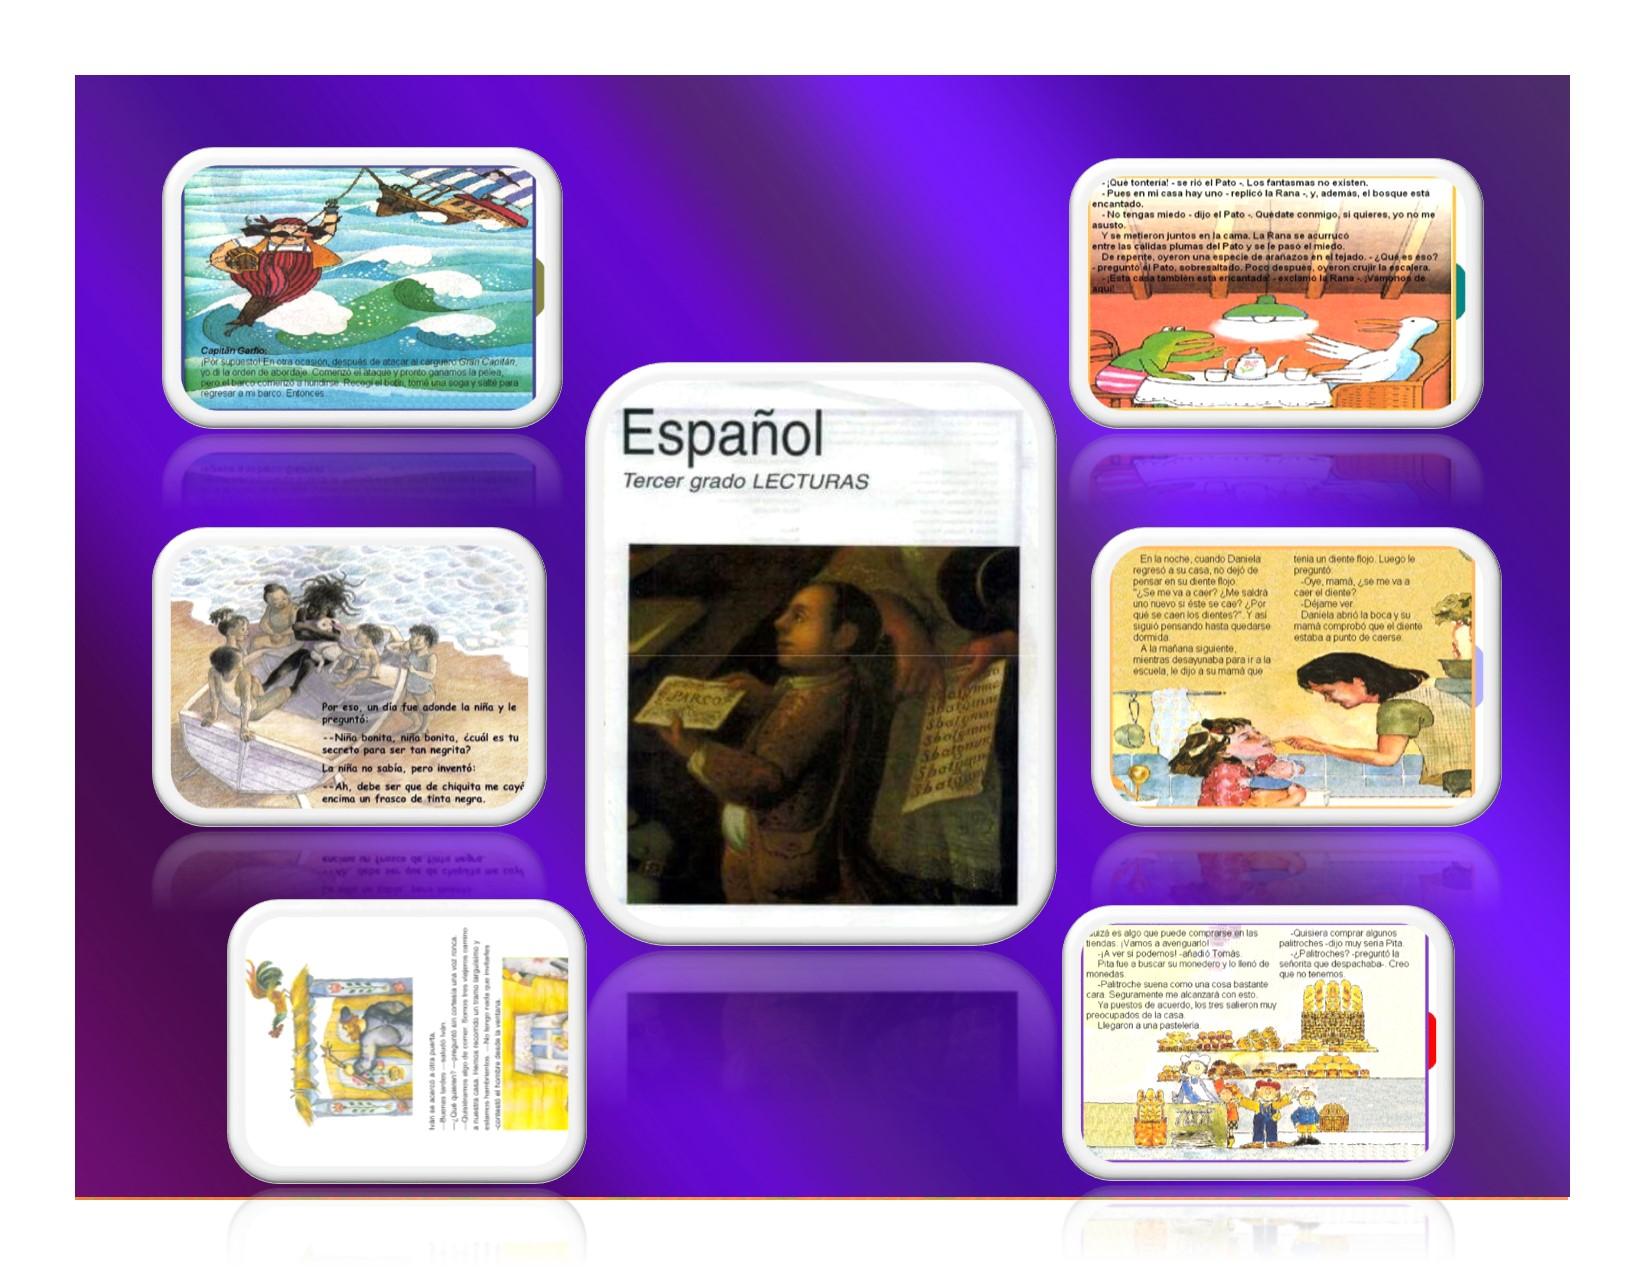 libro-espanol-tercer-grado